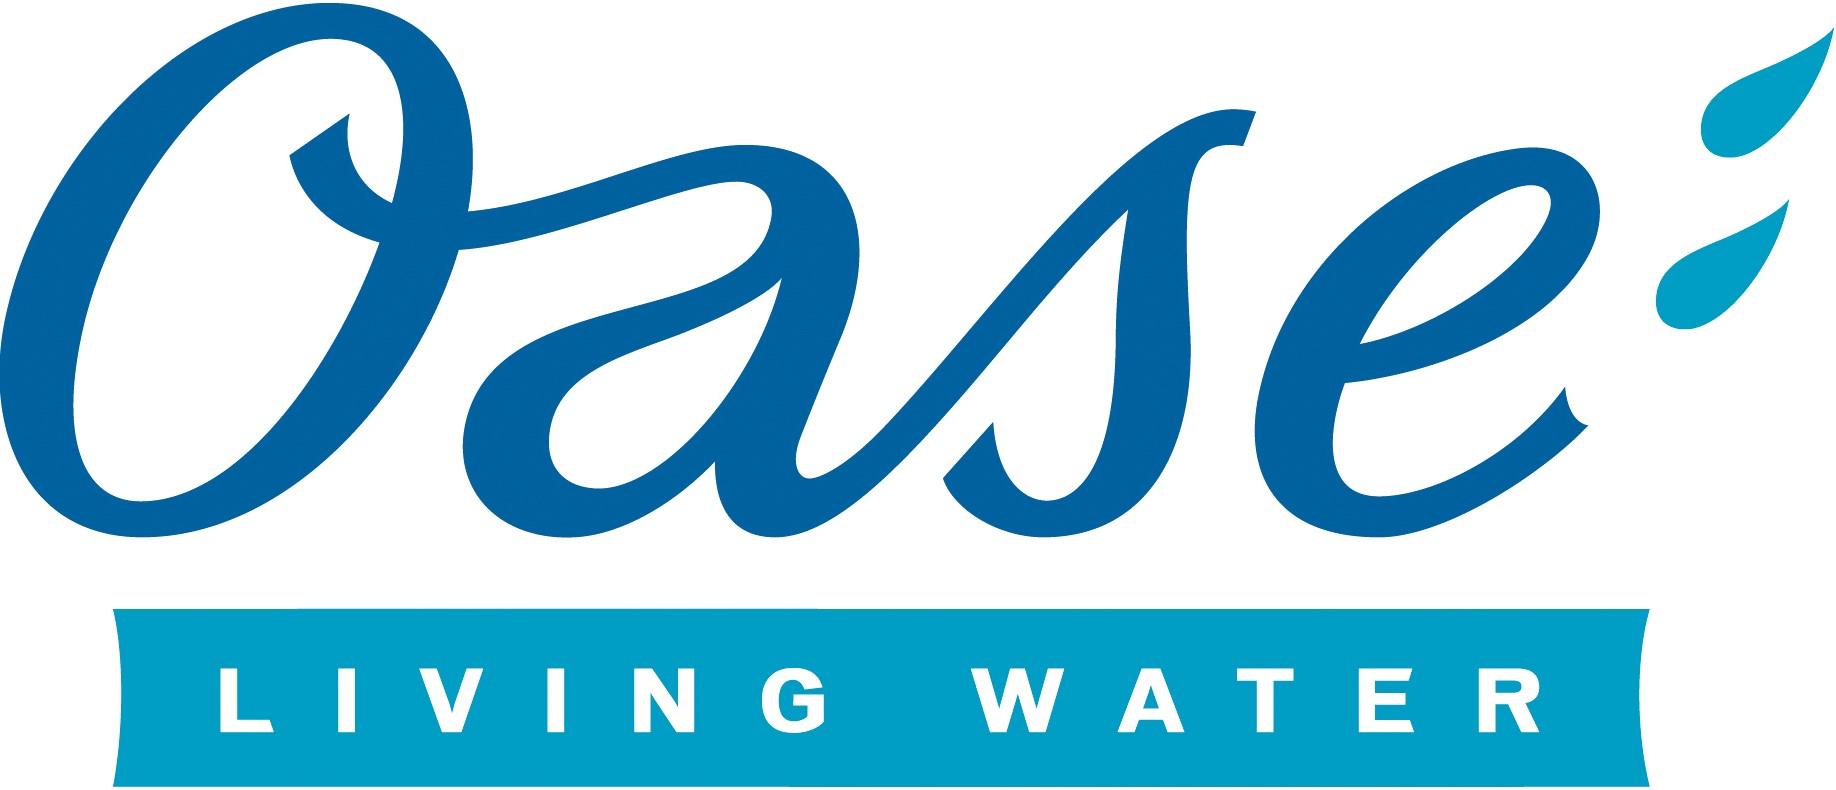 oase logo 2